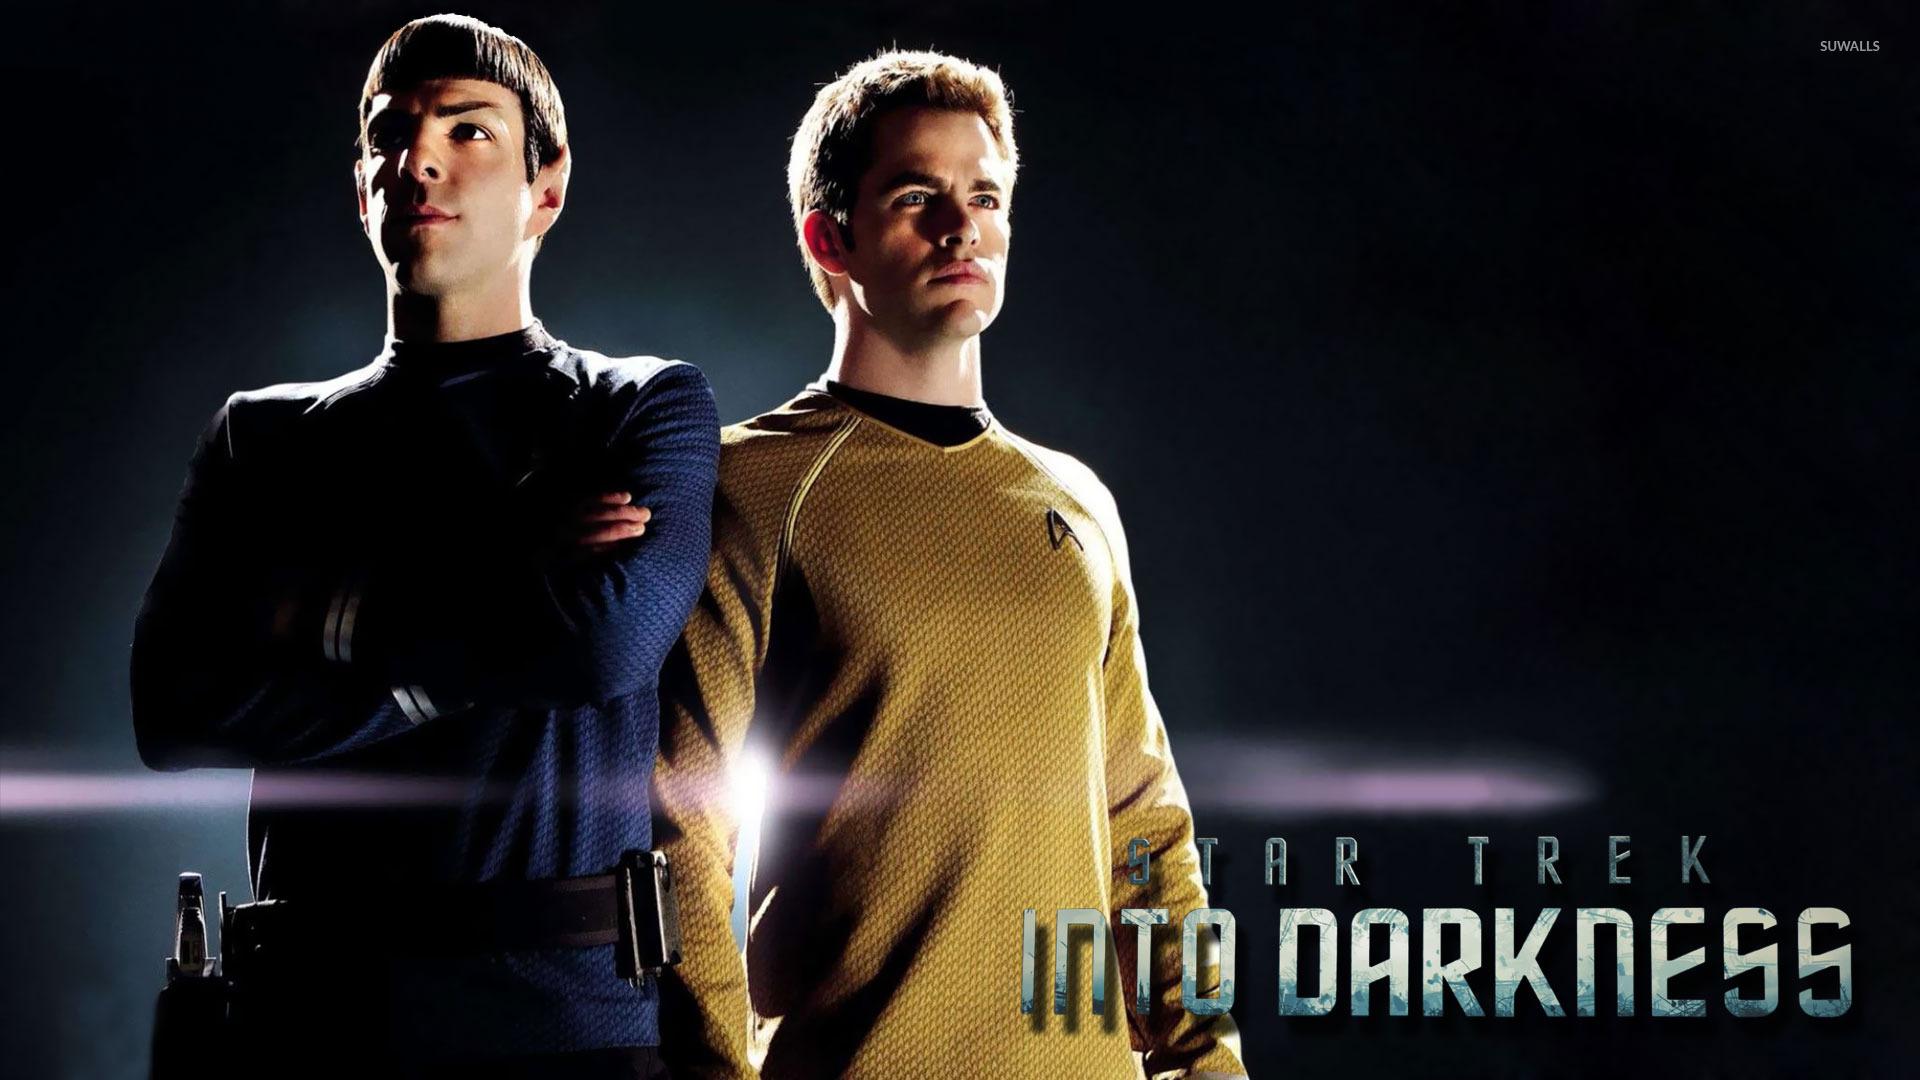 Star Trek Into Darkness 2 Wallpaper Movie Wallpapers 20590